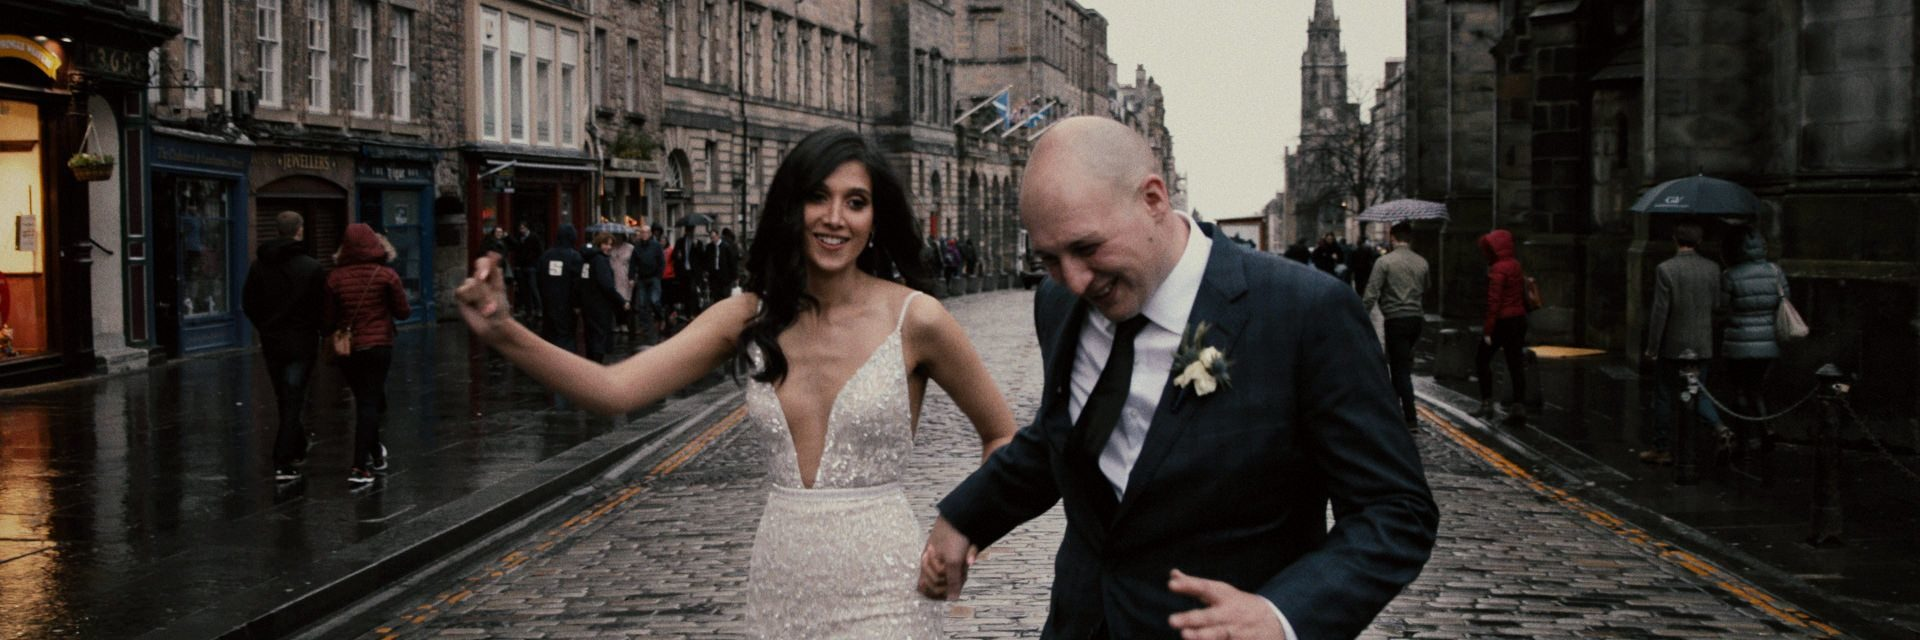 Noto-wedding-videographer-cinemate-films-04